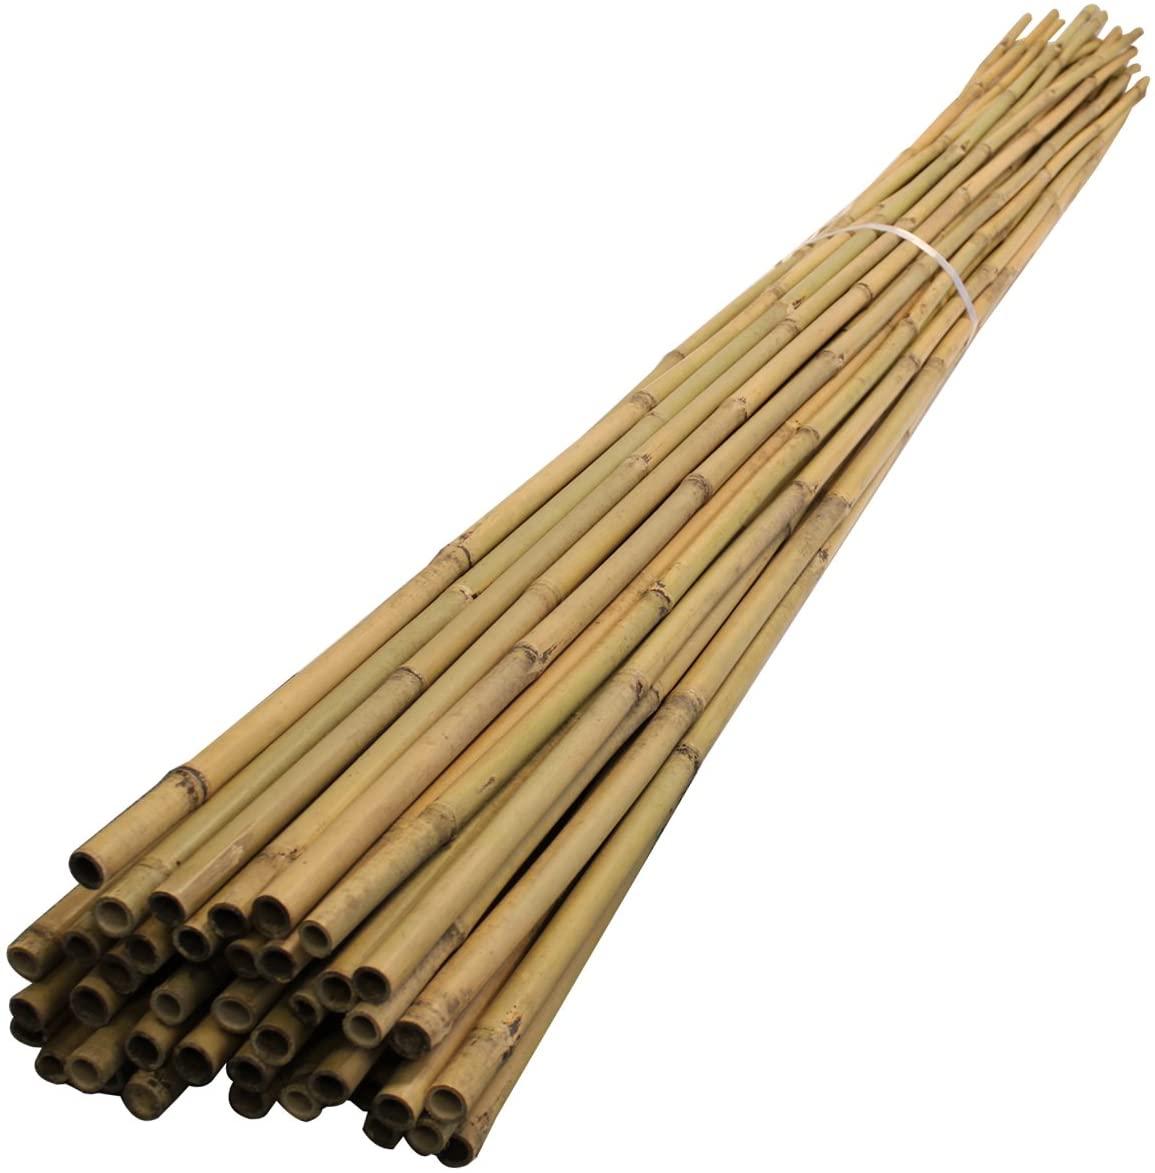 bamboo garden cane ten pack